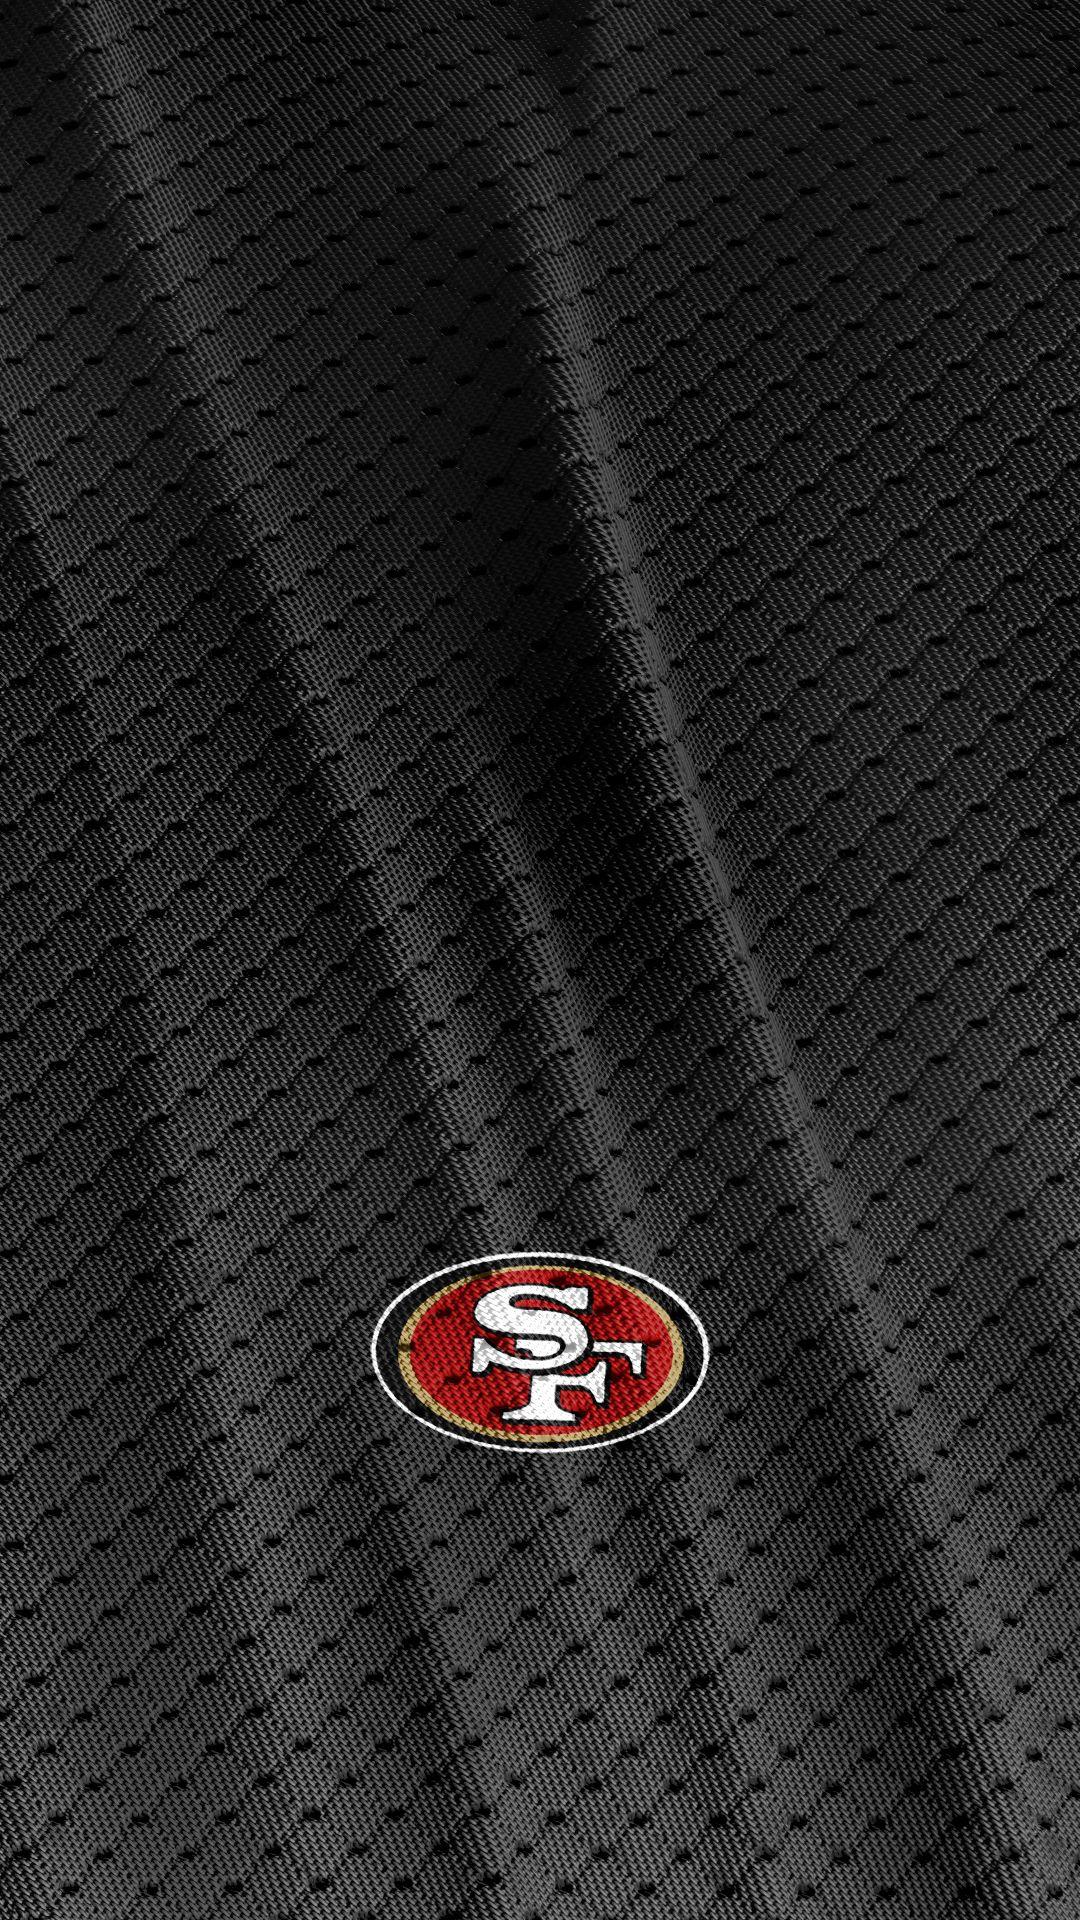 Wallpaper of 49ers - 49ers wallpaper iphone 5 ...